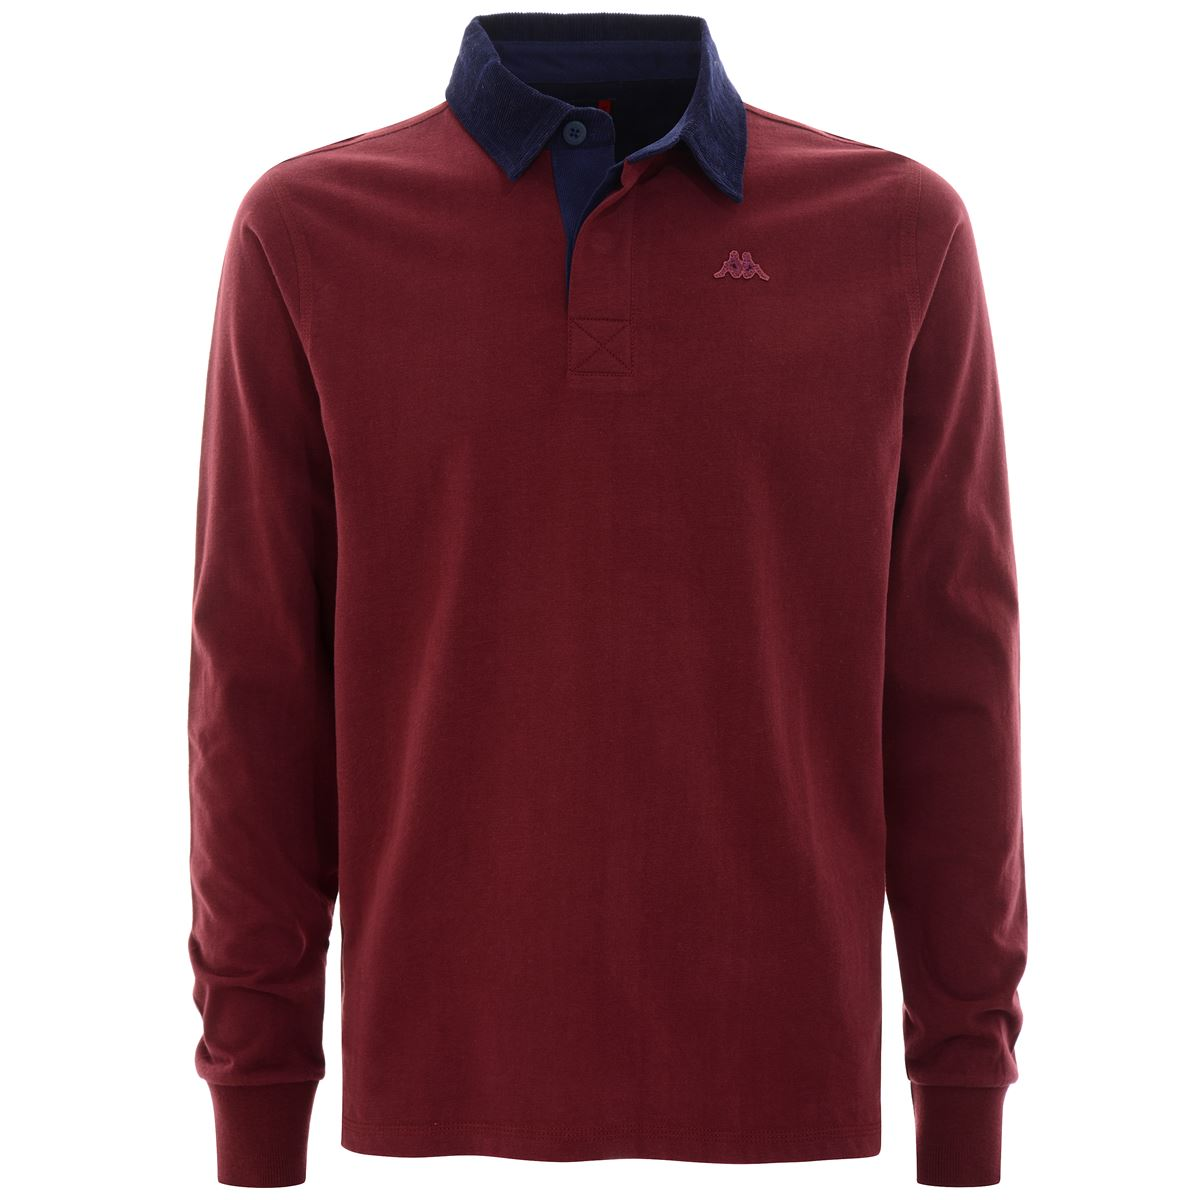 Robe di Kappa Polo Shirts uomo-6111B7W